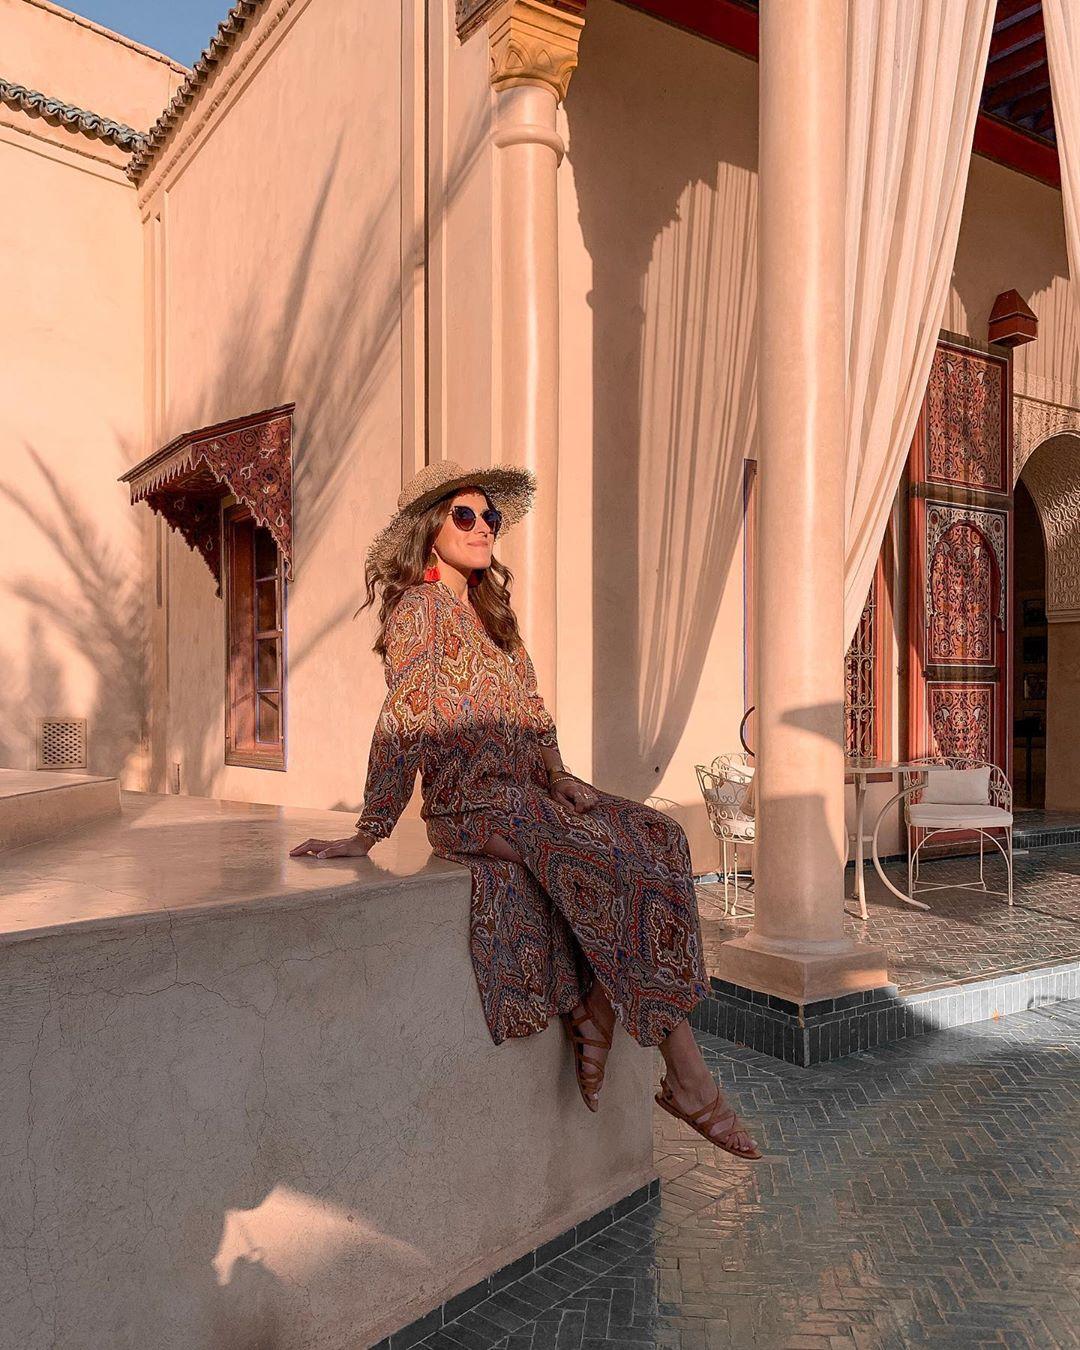 printed flowing dress de Zara sur lesbonheursdecamille